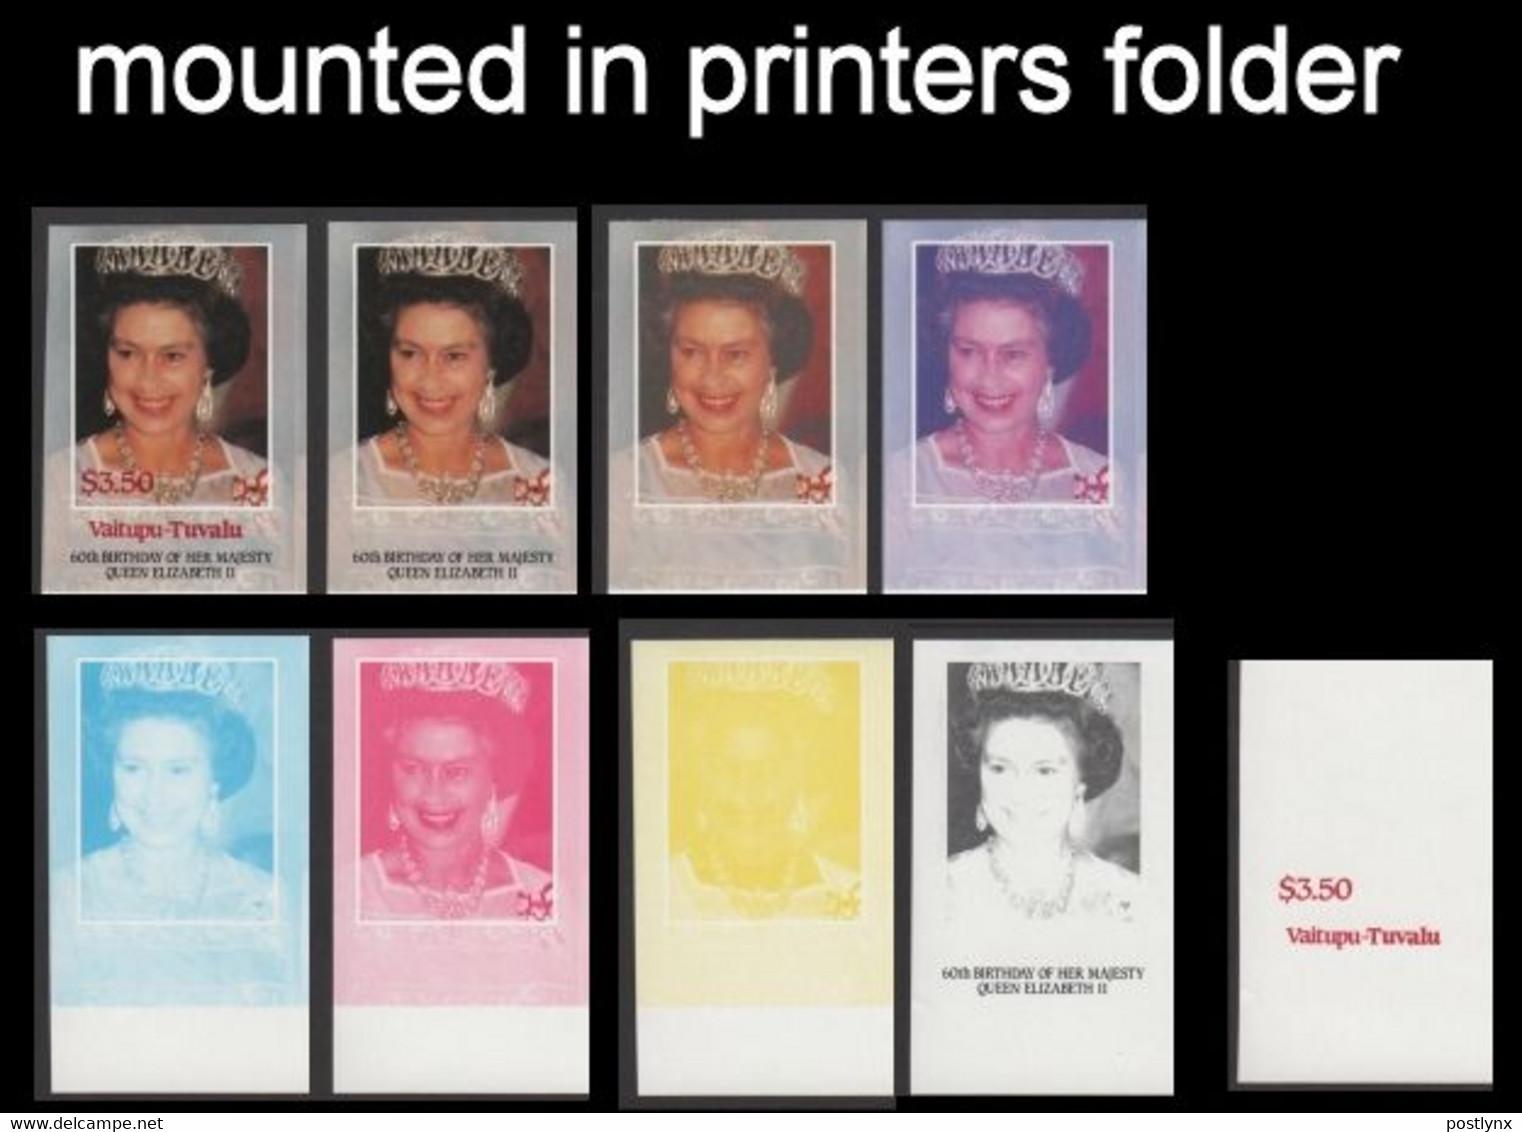 TUVALU-Vaitupu 1986 Q2 Birthday $3.50 PROGRESSIVE PROOFS:9 Items In Printers Fldr - Tuvalu